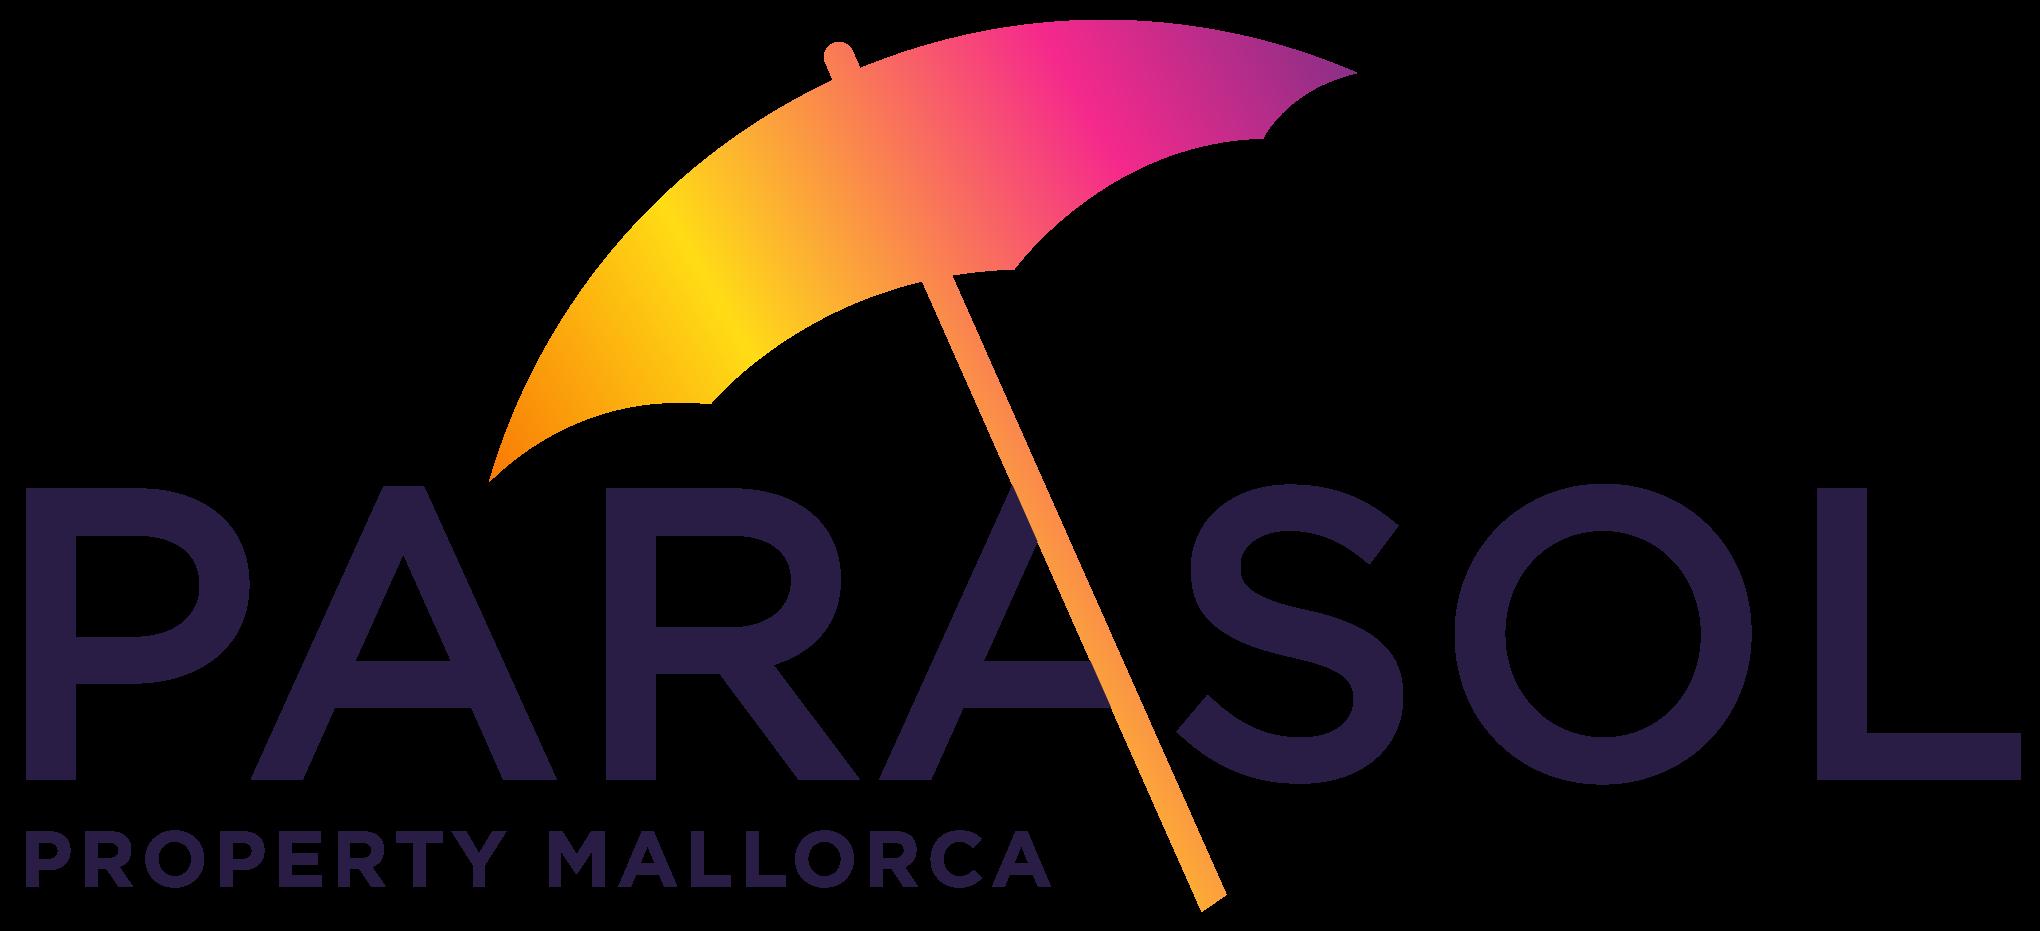 Parasol Property Mallorca